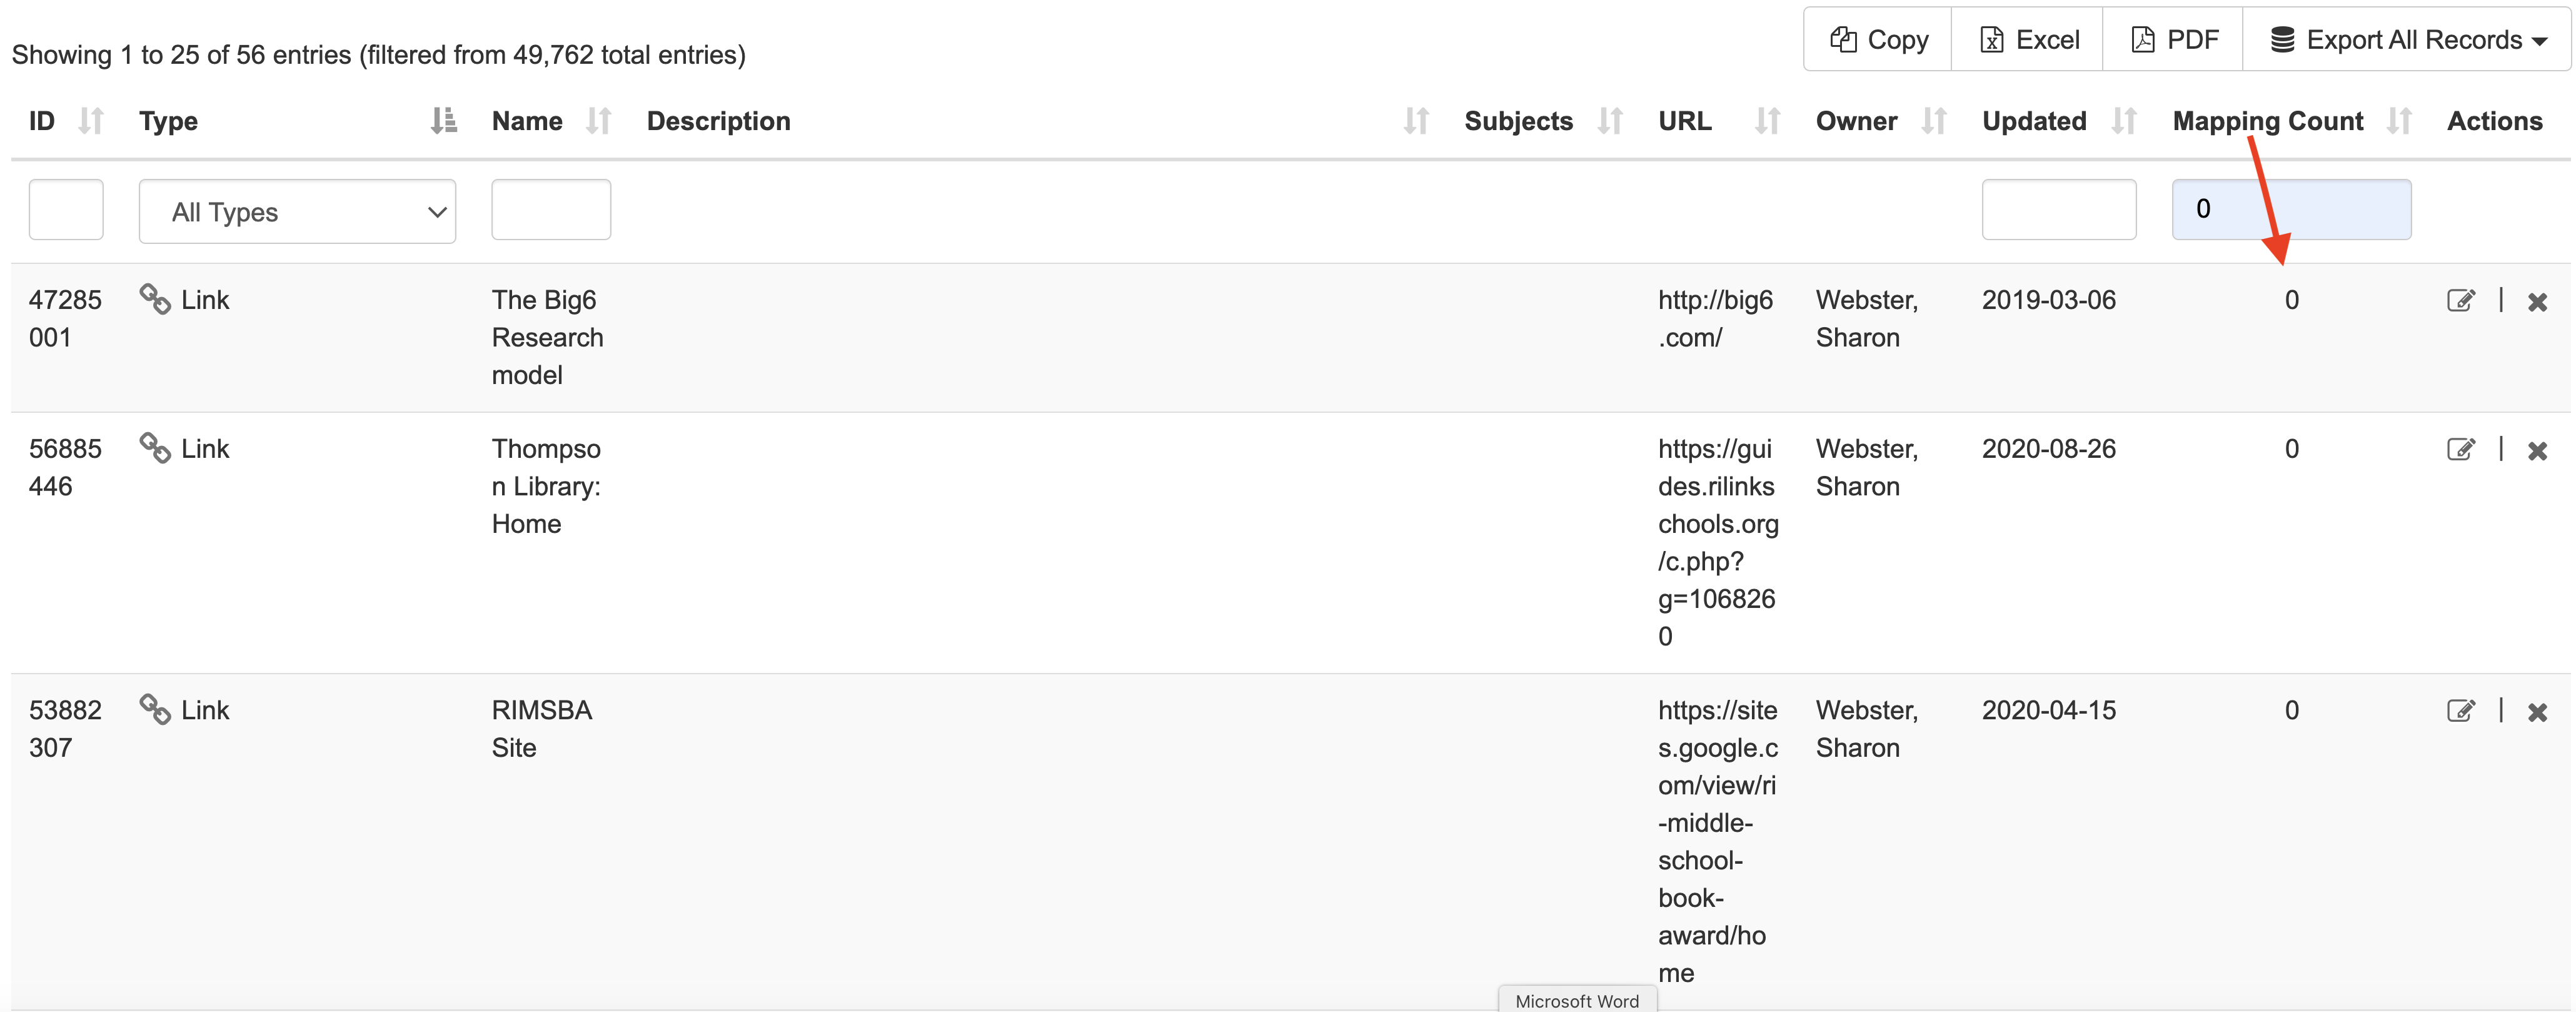 screenshot of unmapped assets